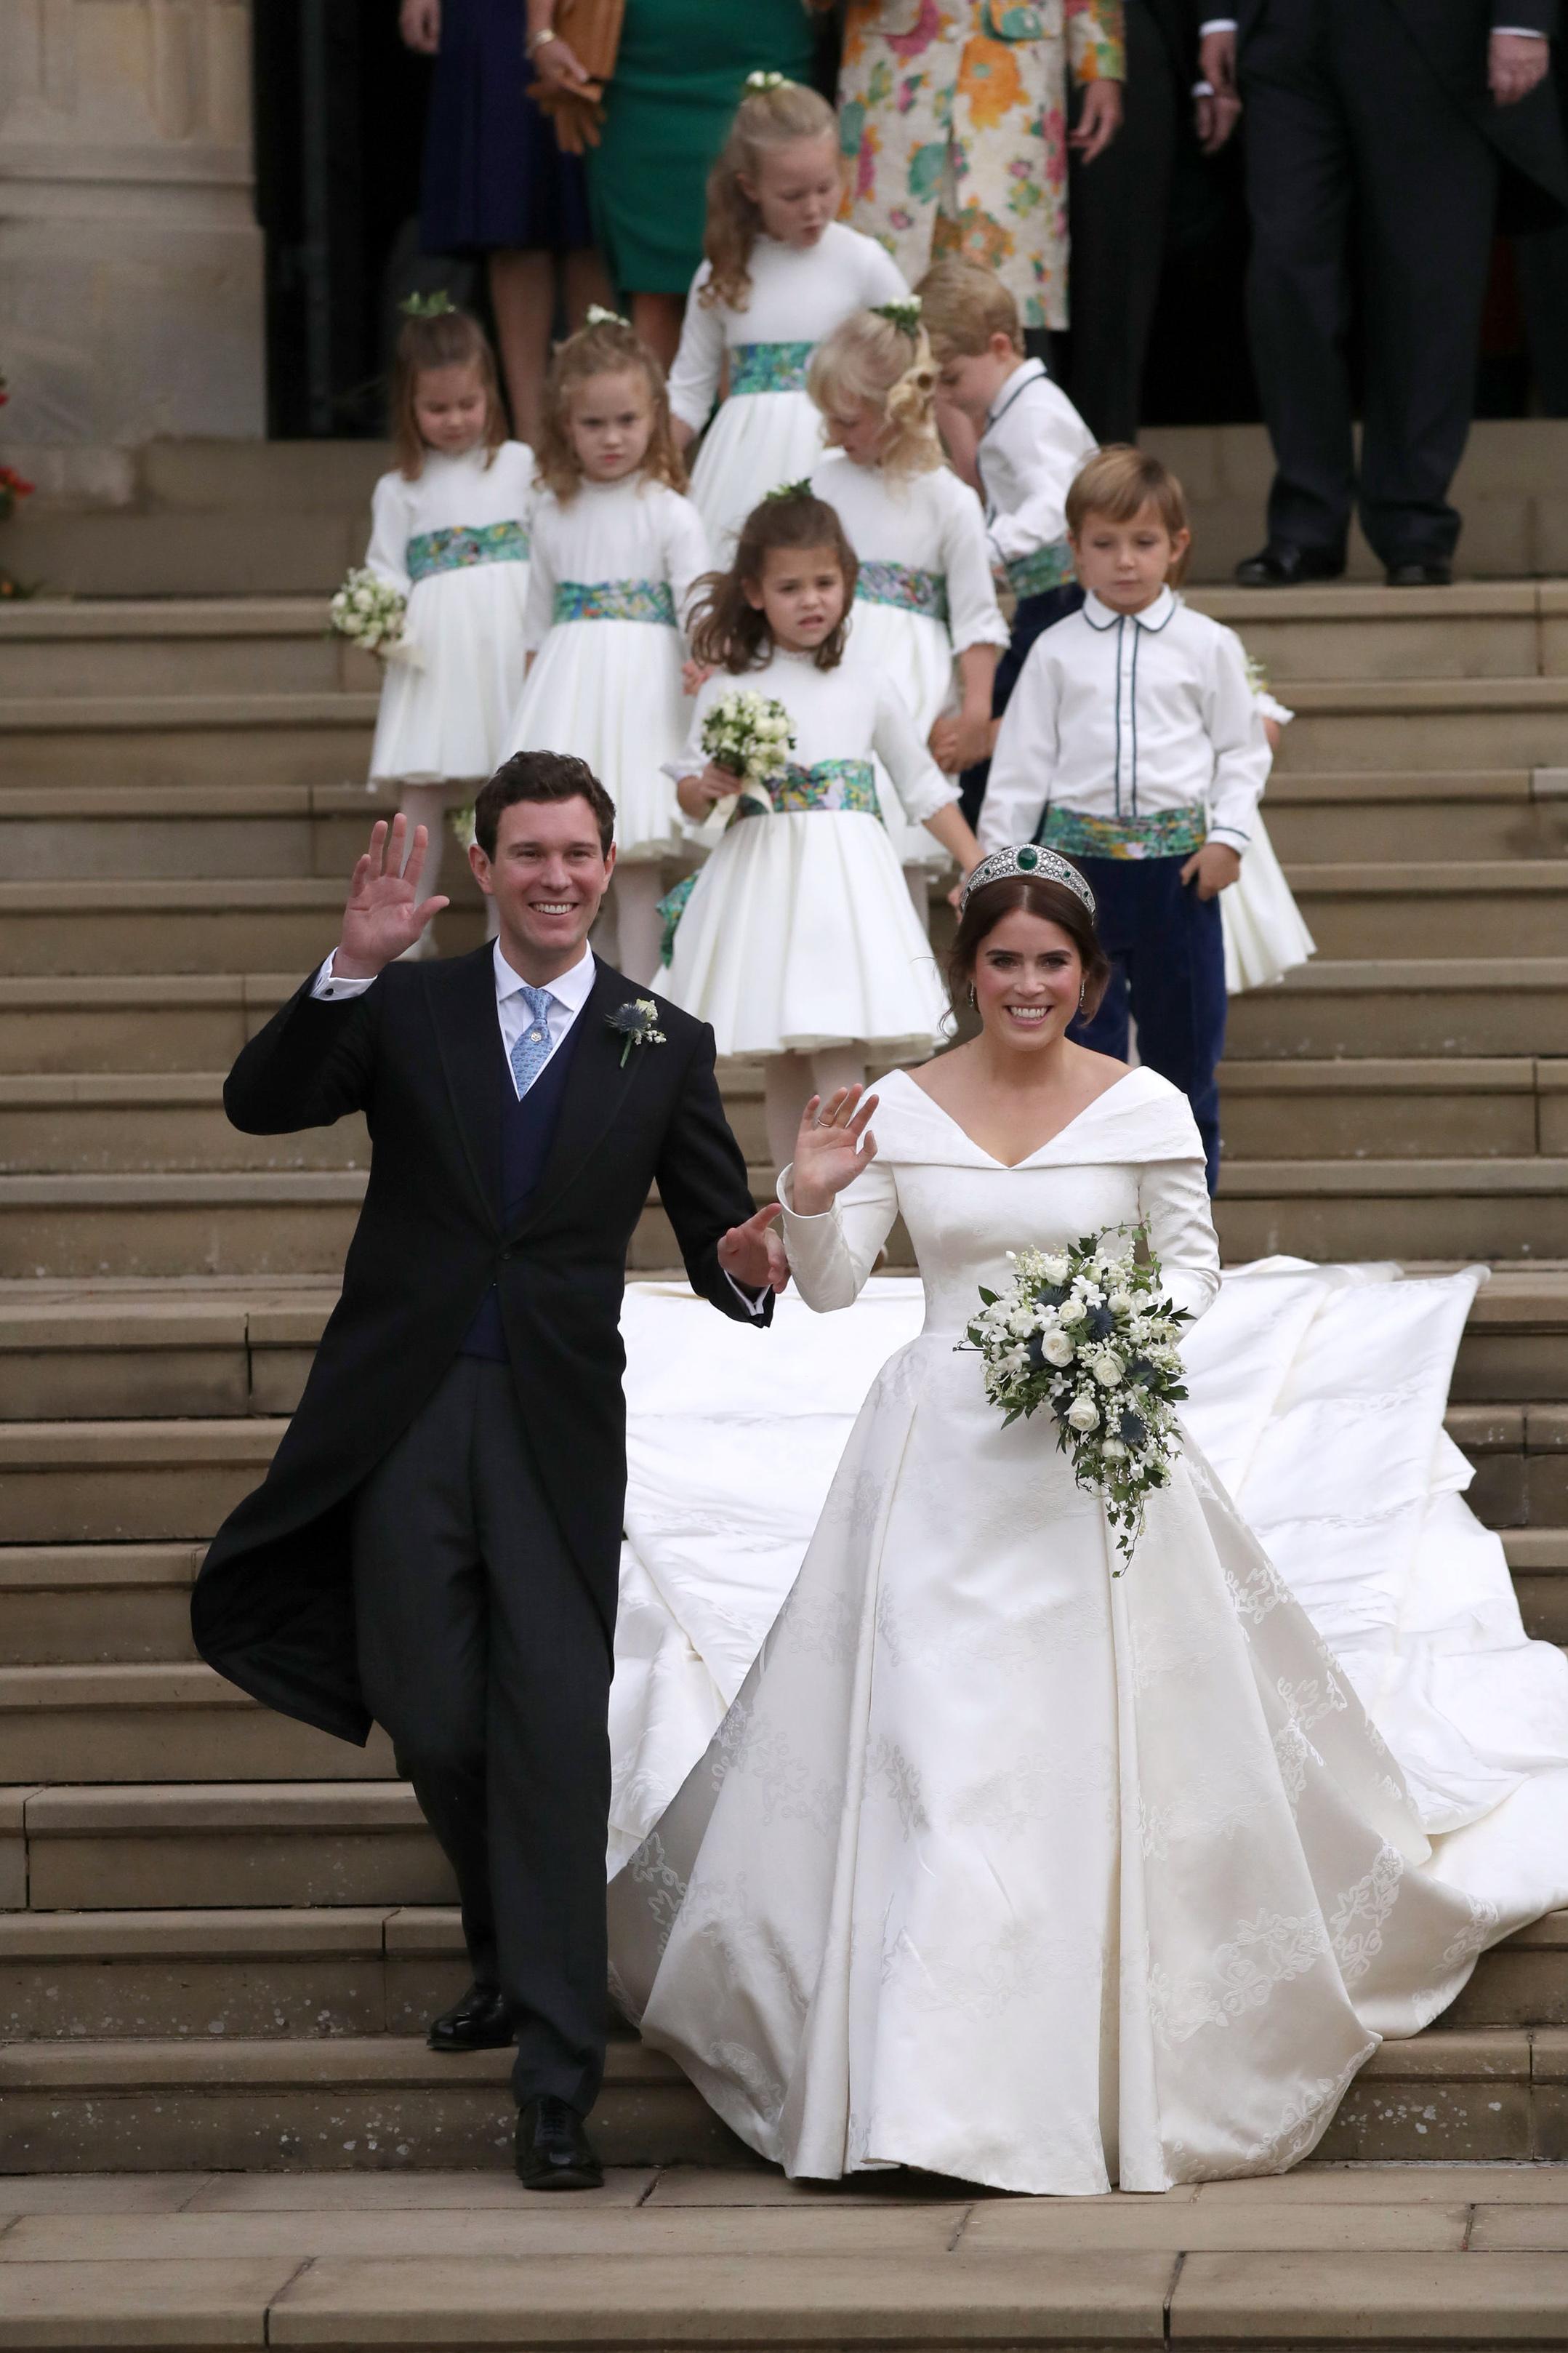 he wedding of Princess Eugenie and Jack Brooksbank